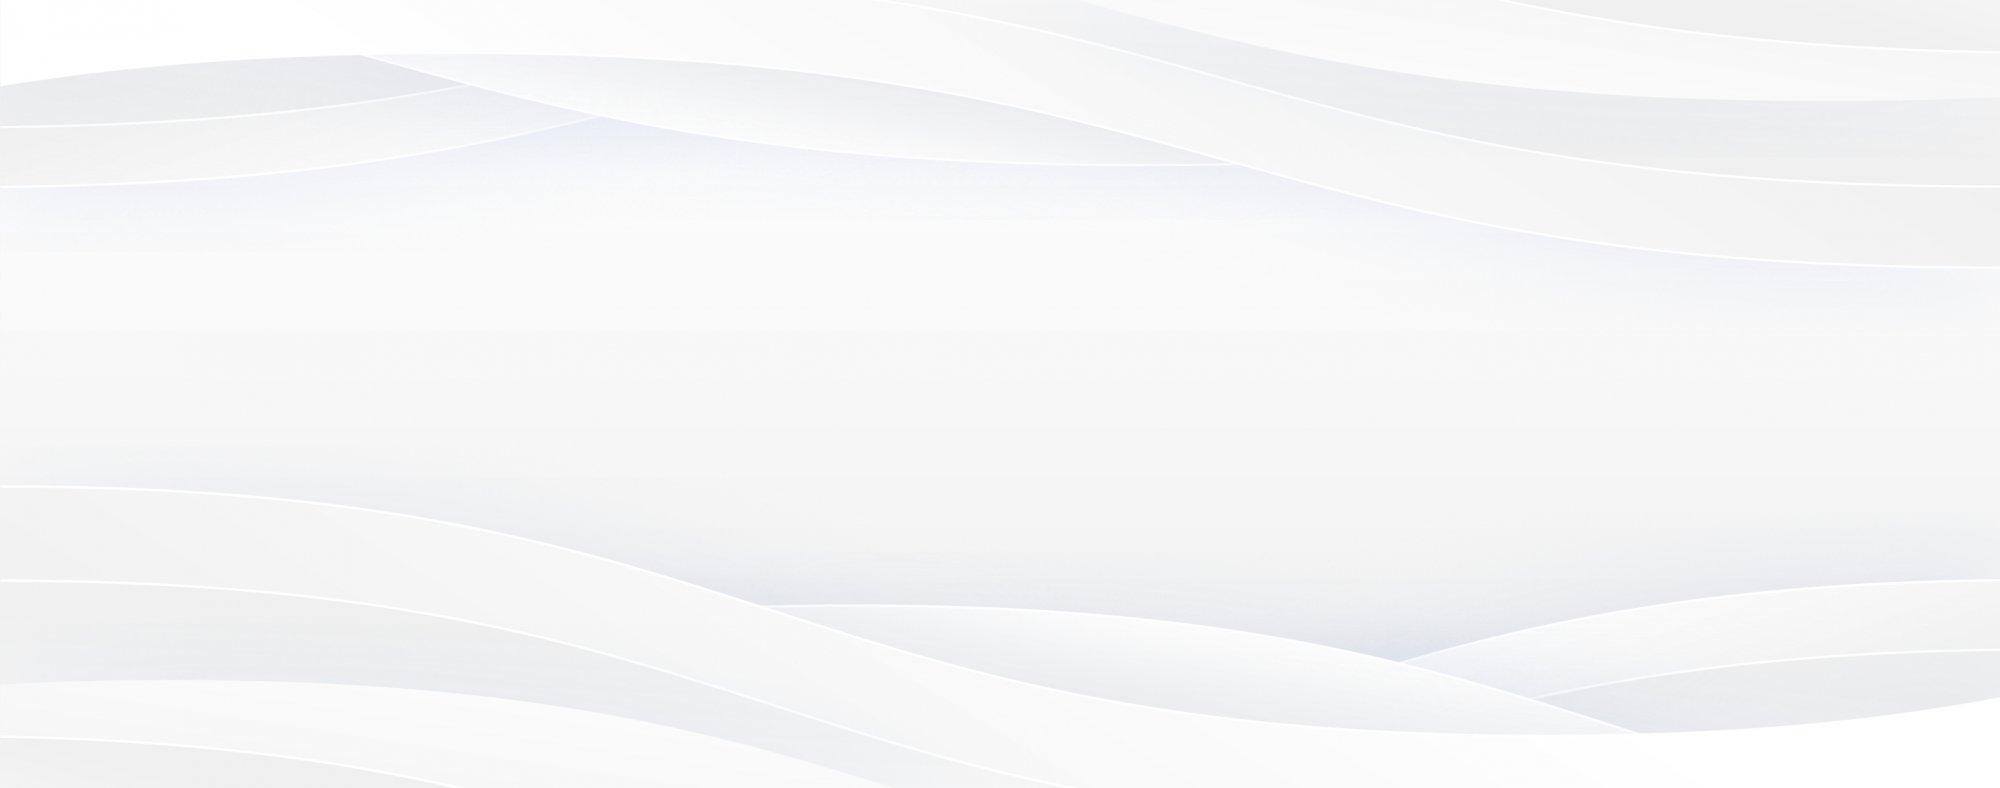 proptech-dach-update-q3-2021